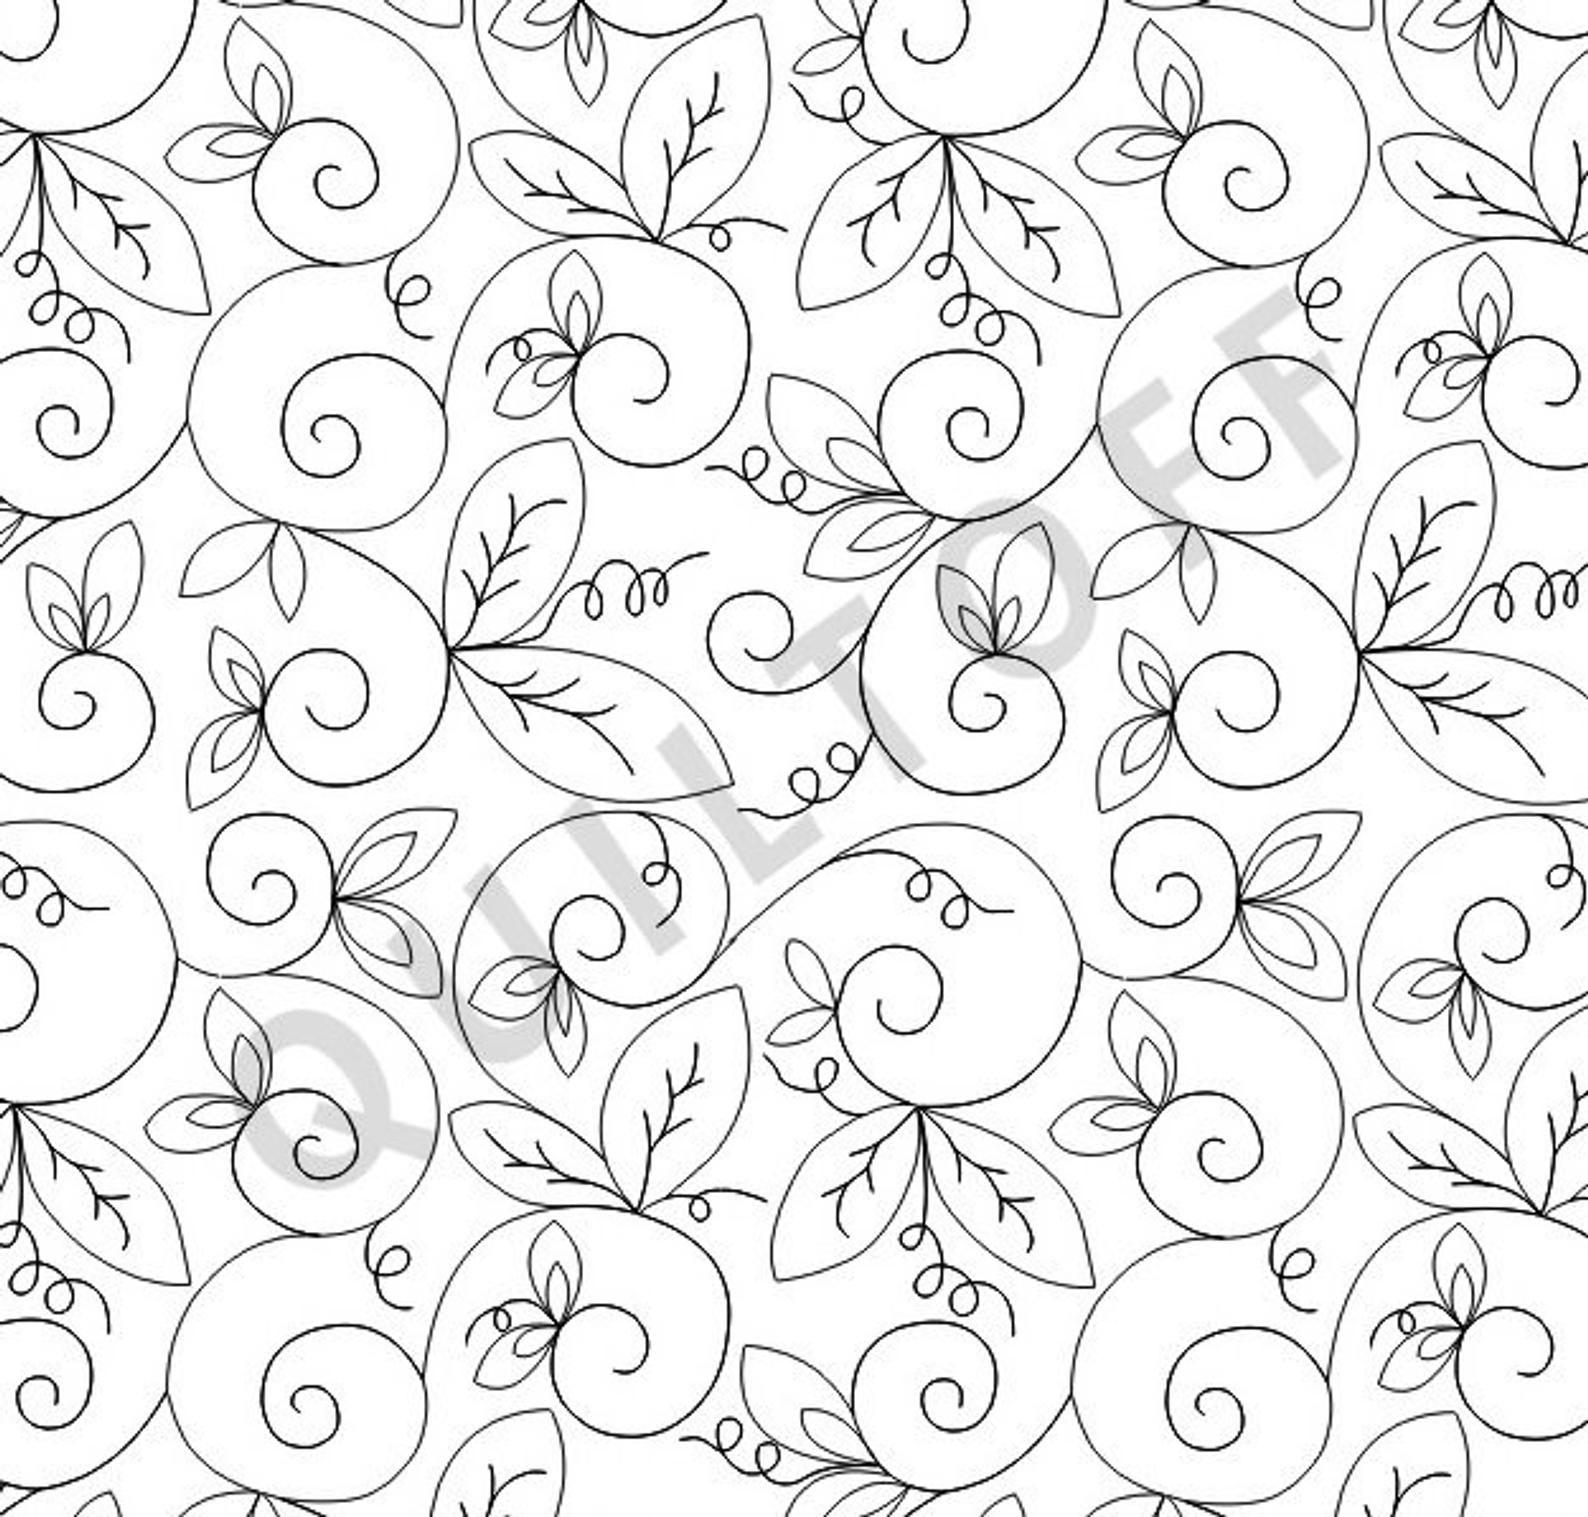 Sweet Pea Digital quilting pattern, design, pantograph in